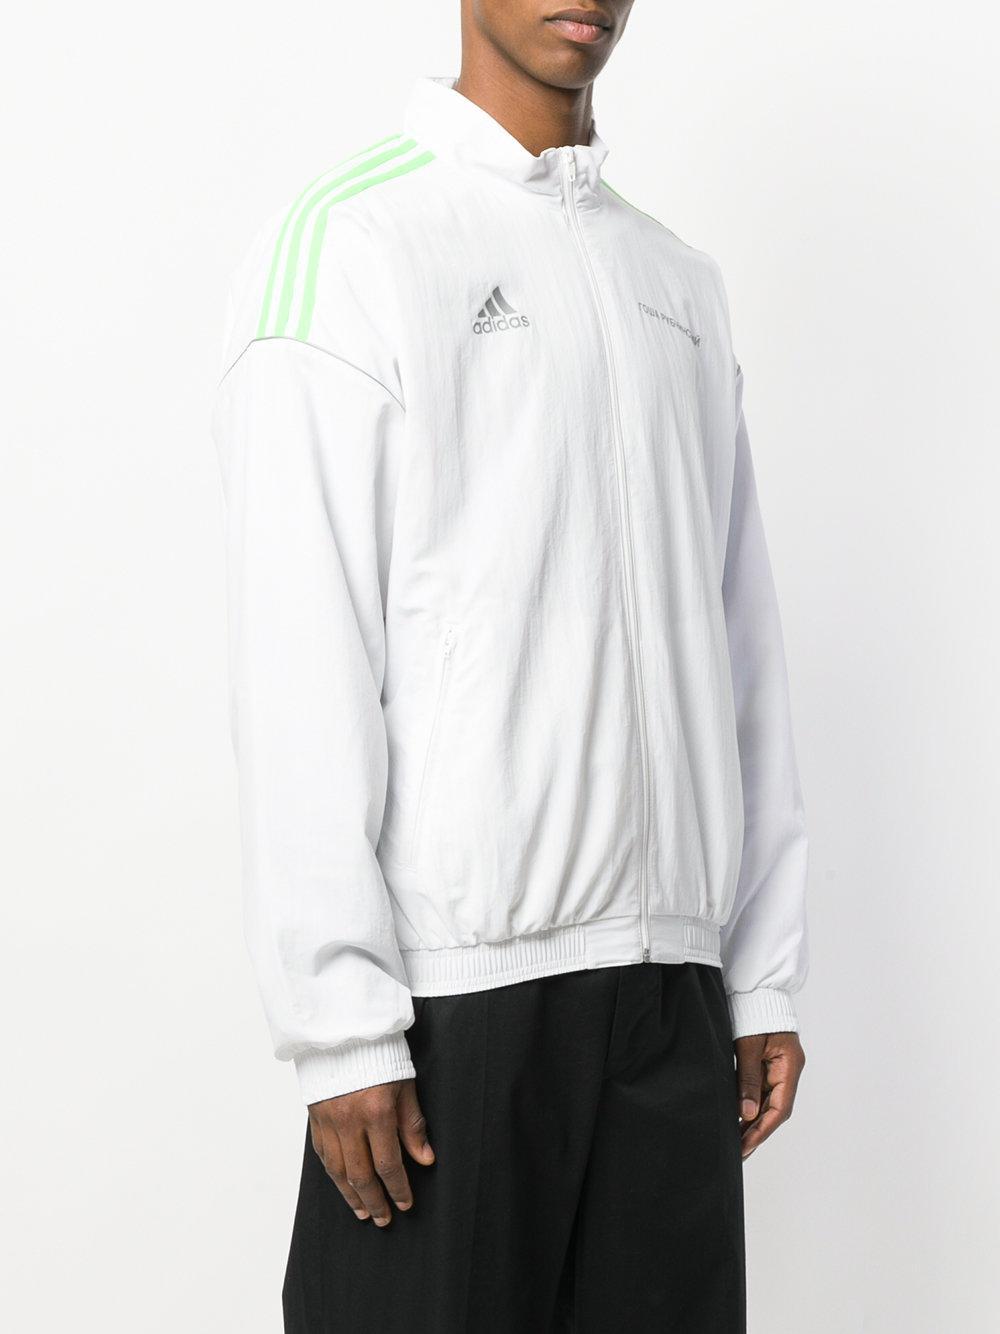 Gosha Rubchinskiy Synthetic Zip Front Track Jacket in White for Men